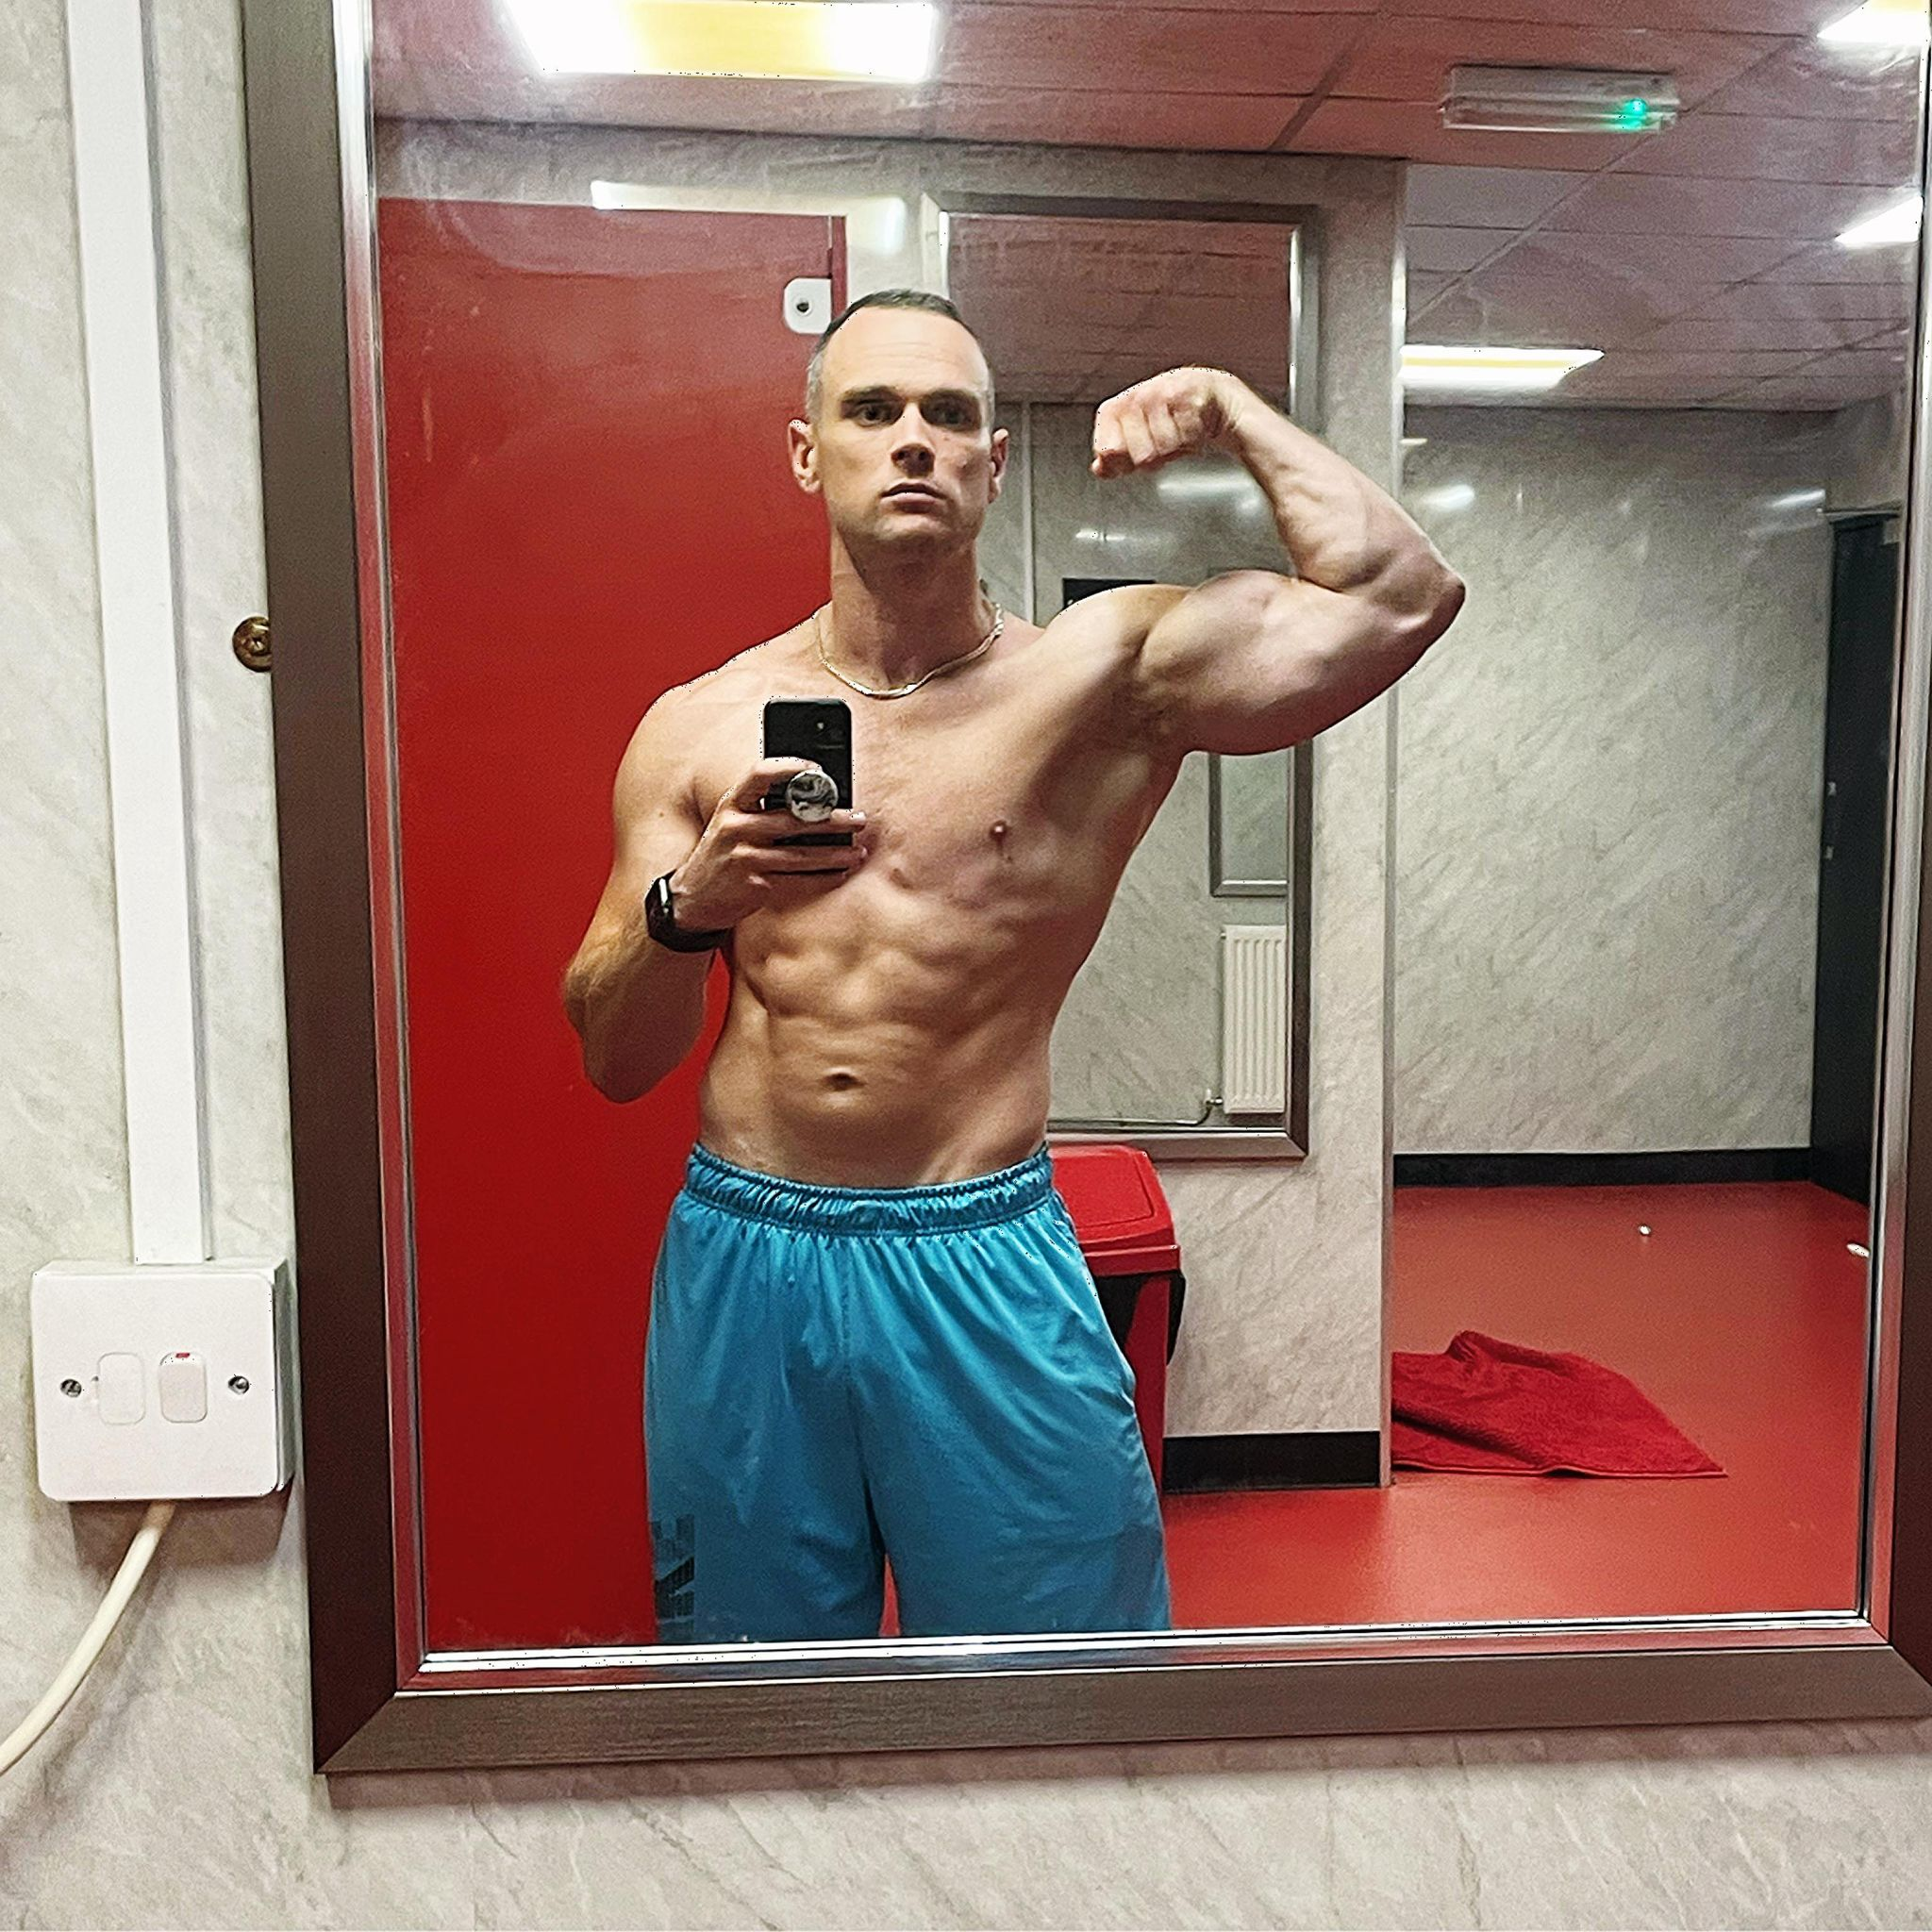 Growing muscle